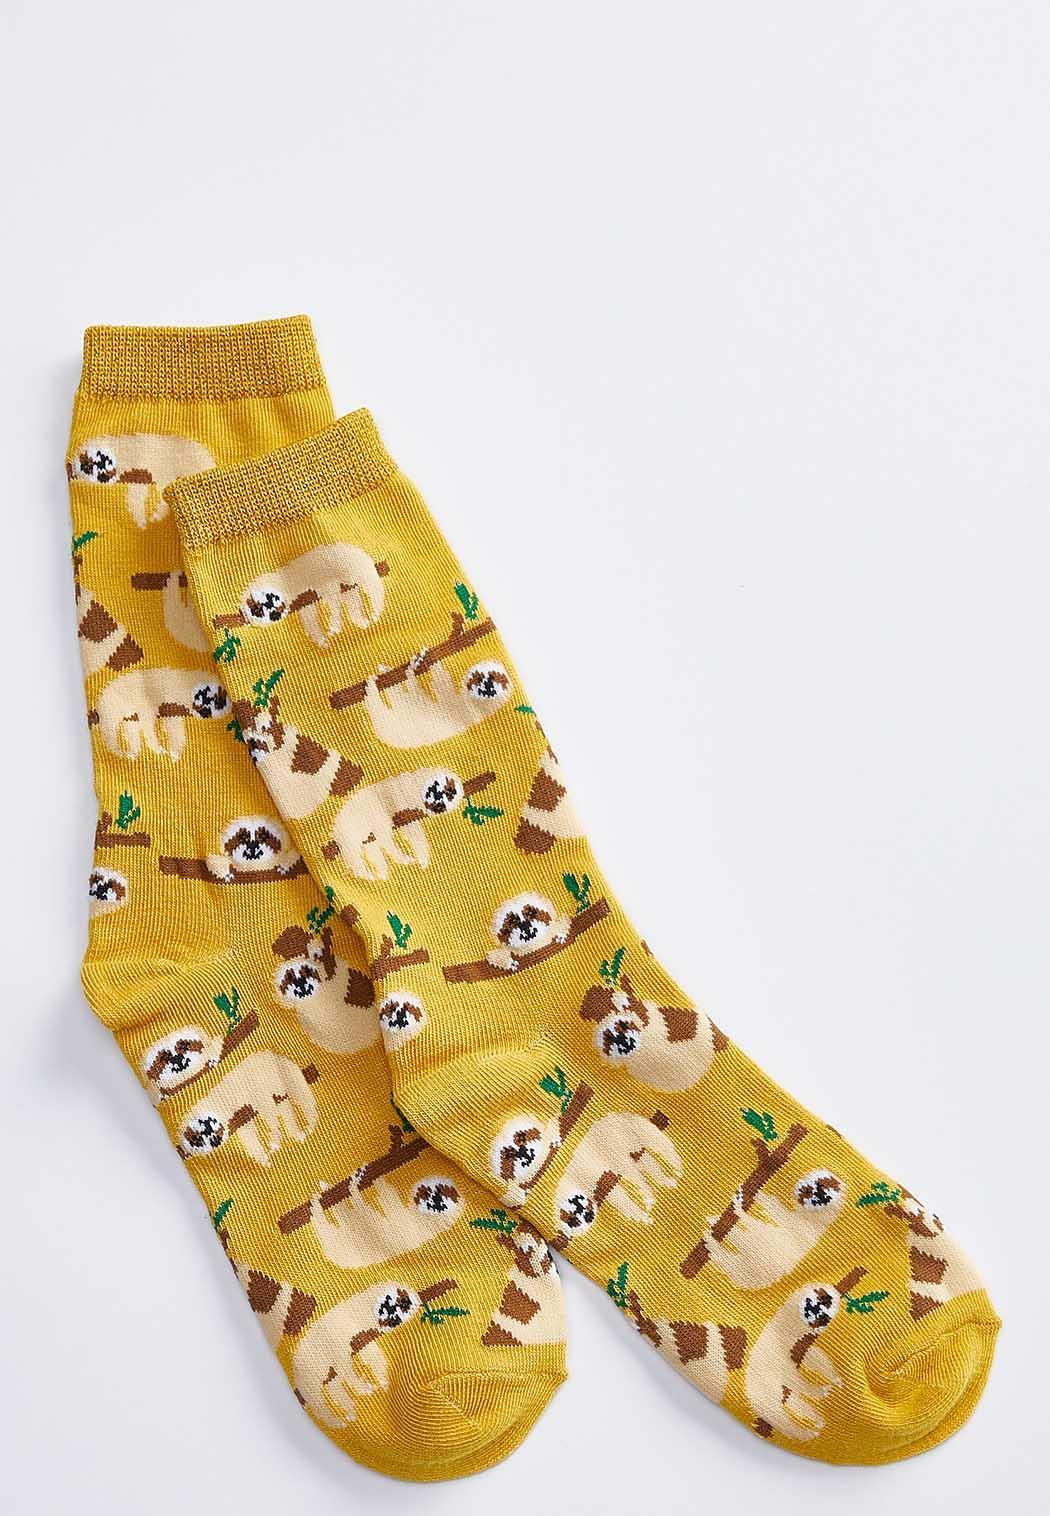 Lounging Sloth Socks